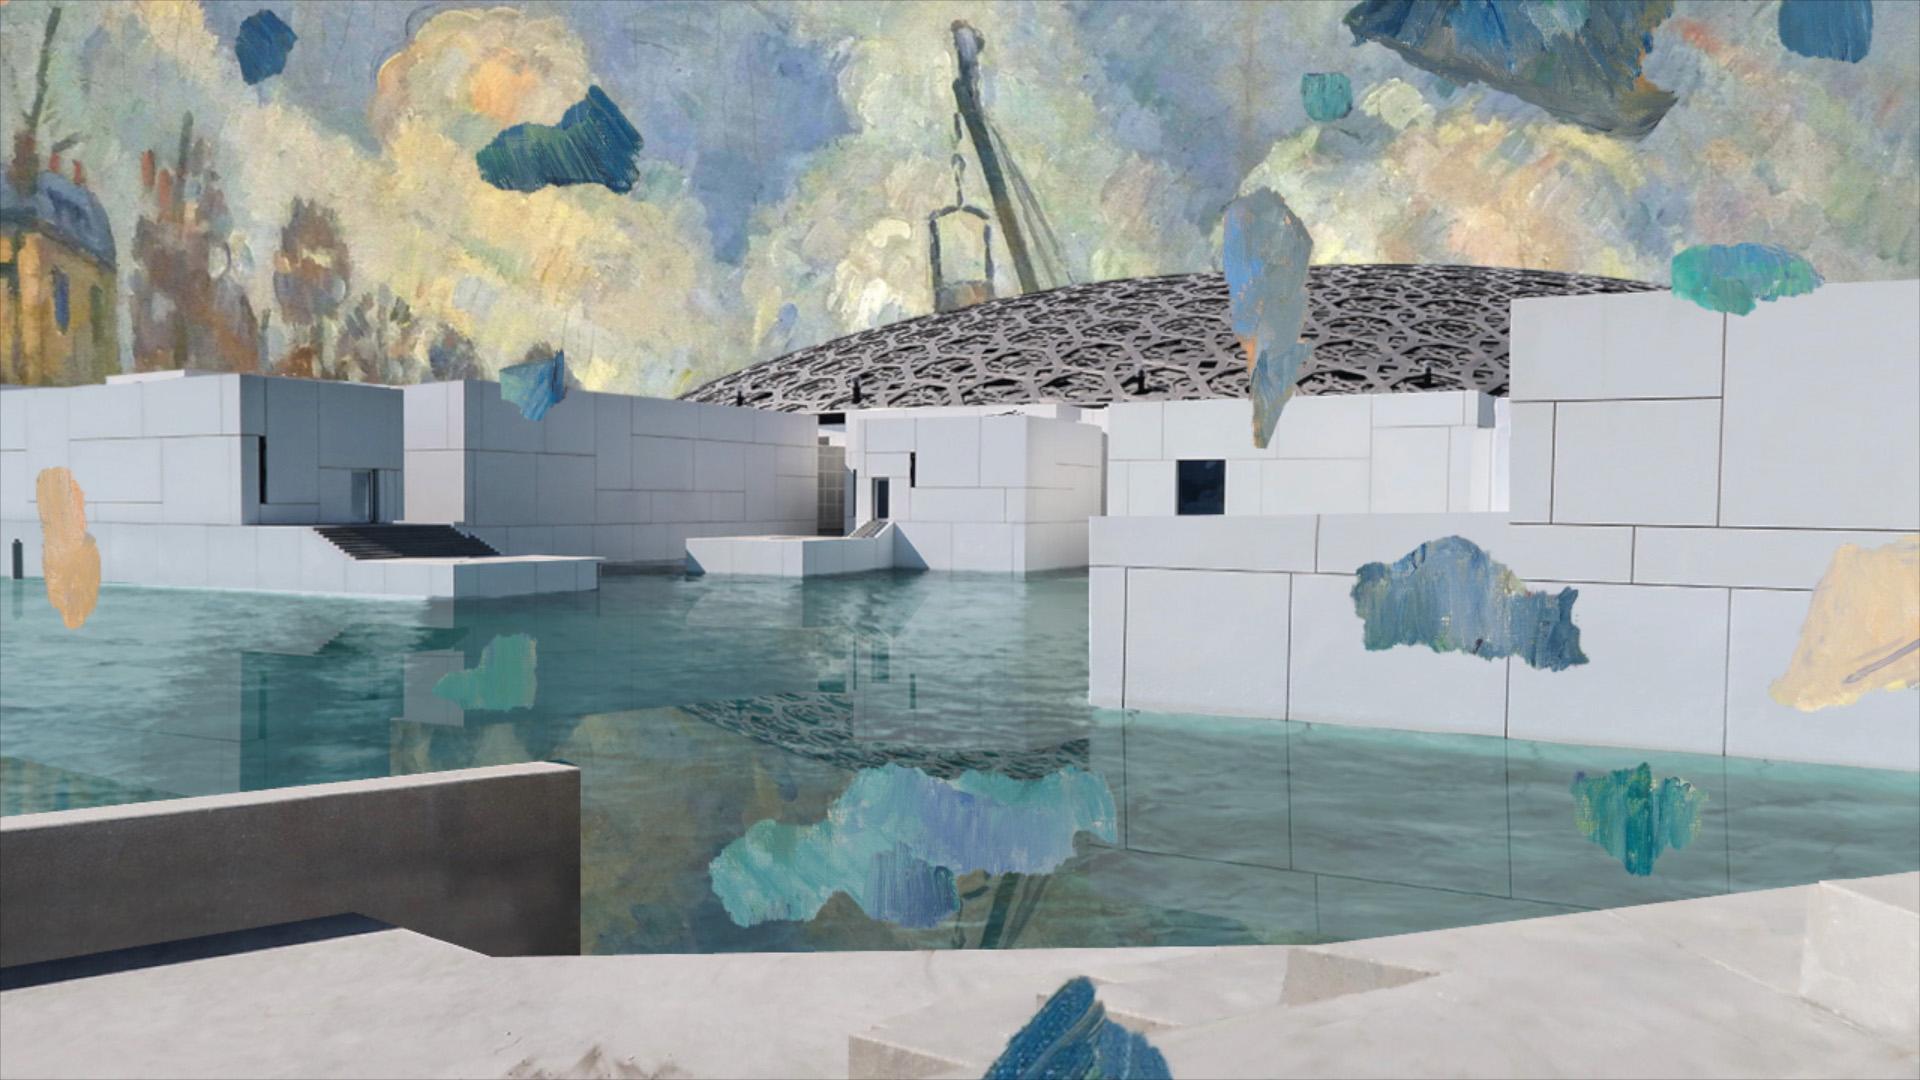 Joe Hamilton - Cezanne Unfixed - Video still 1